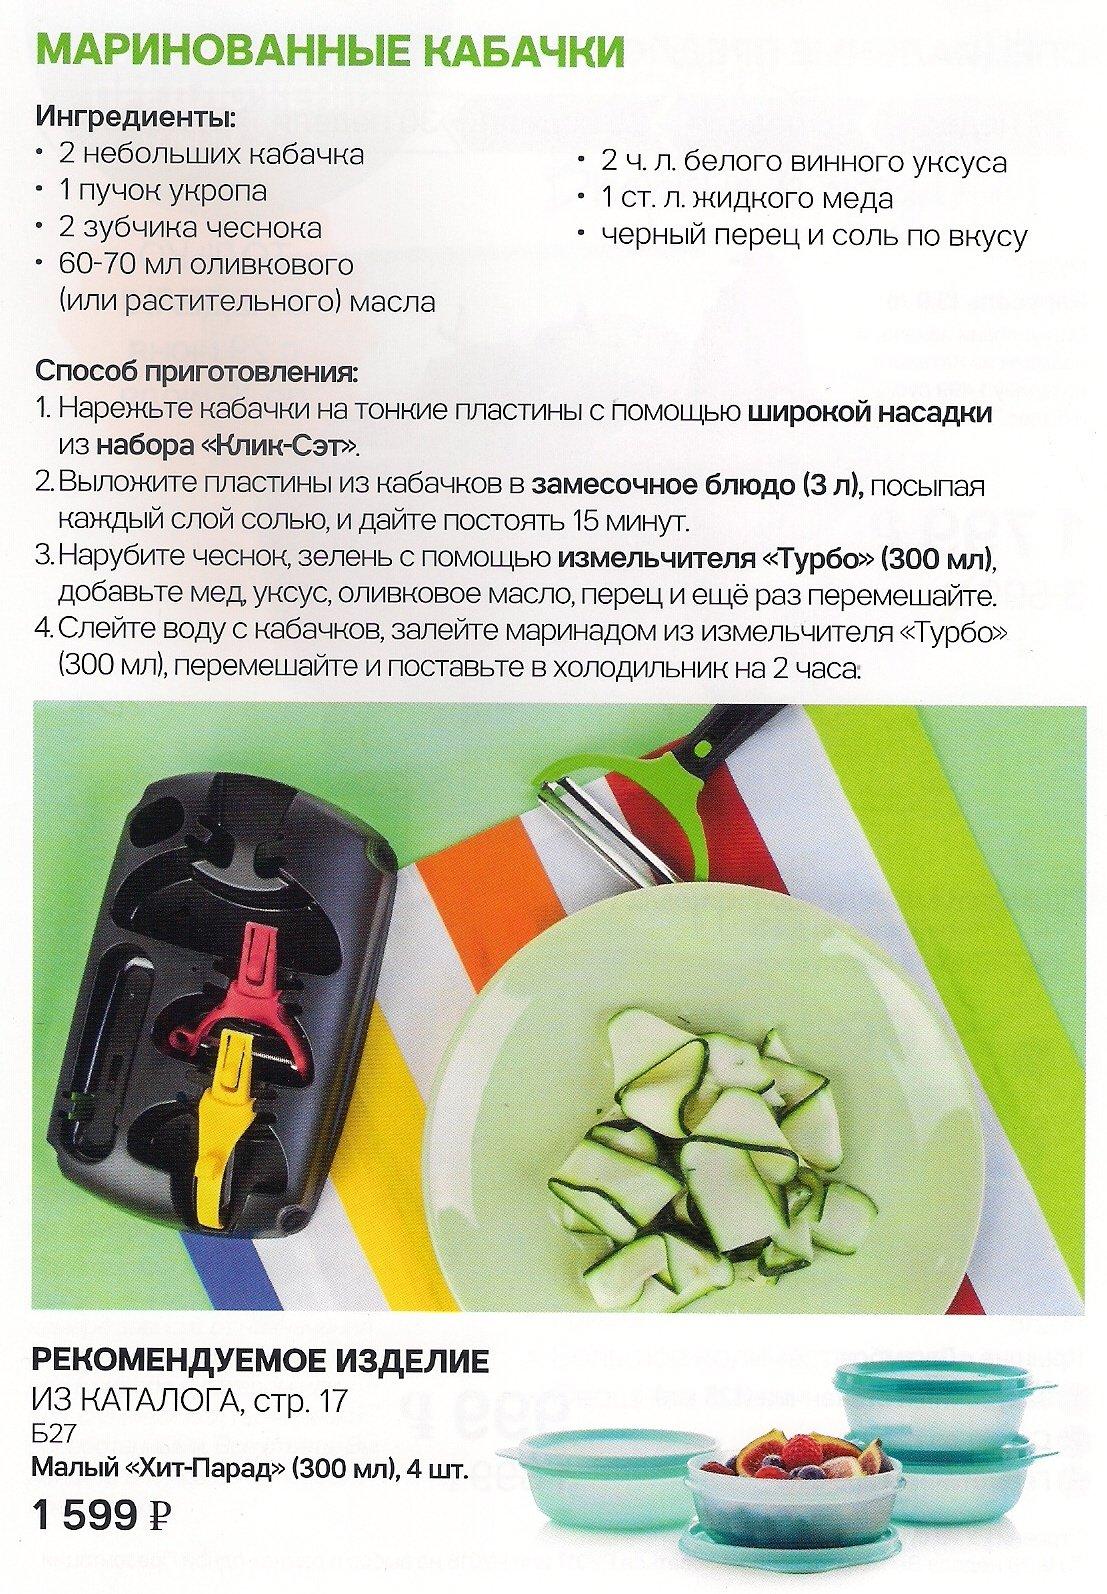 http://tupperware-online.ru/images/upload/9a.jpg